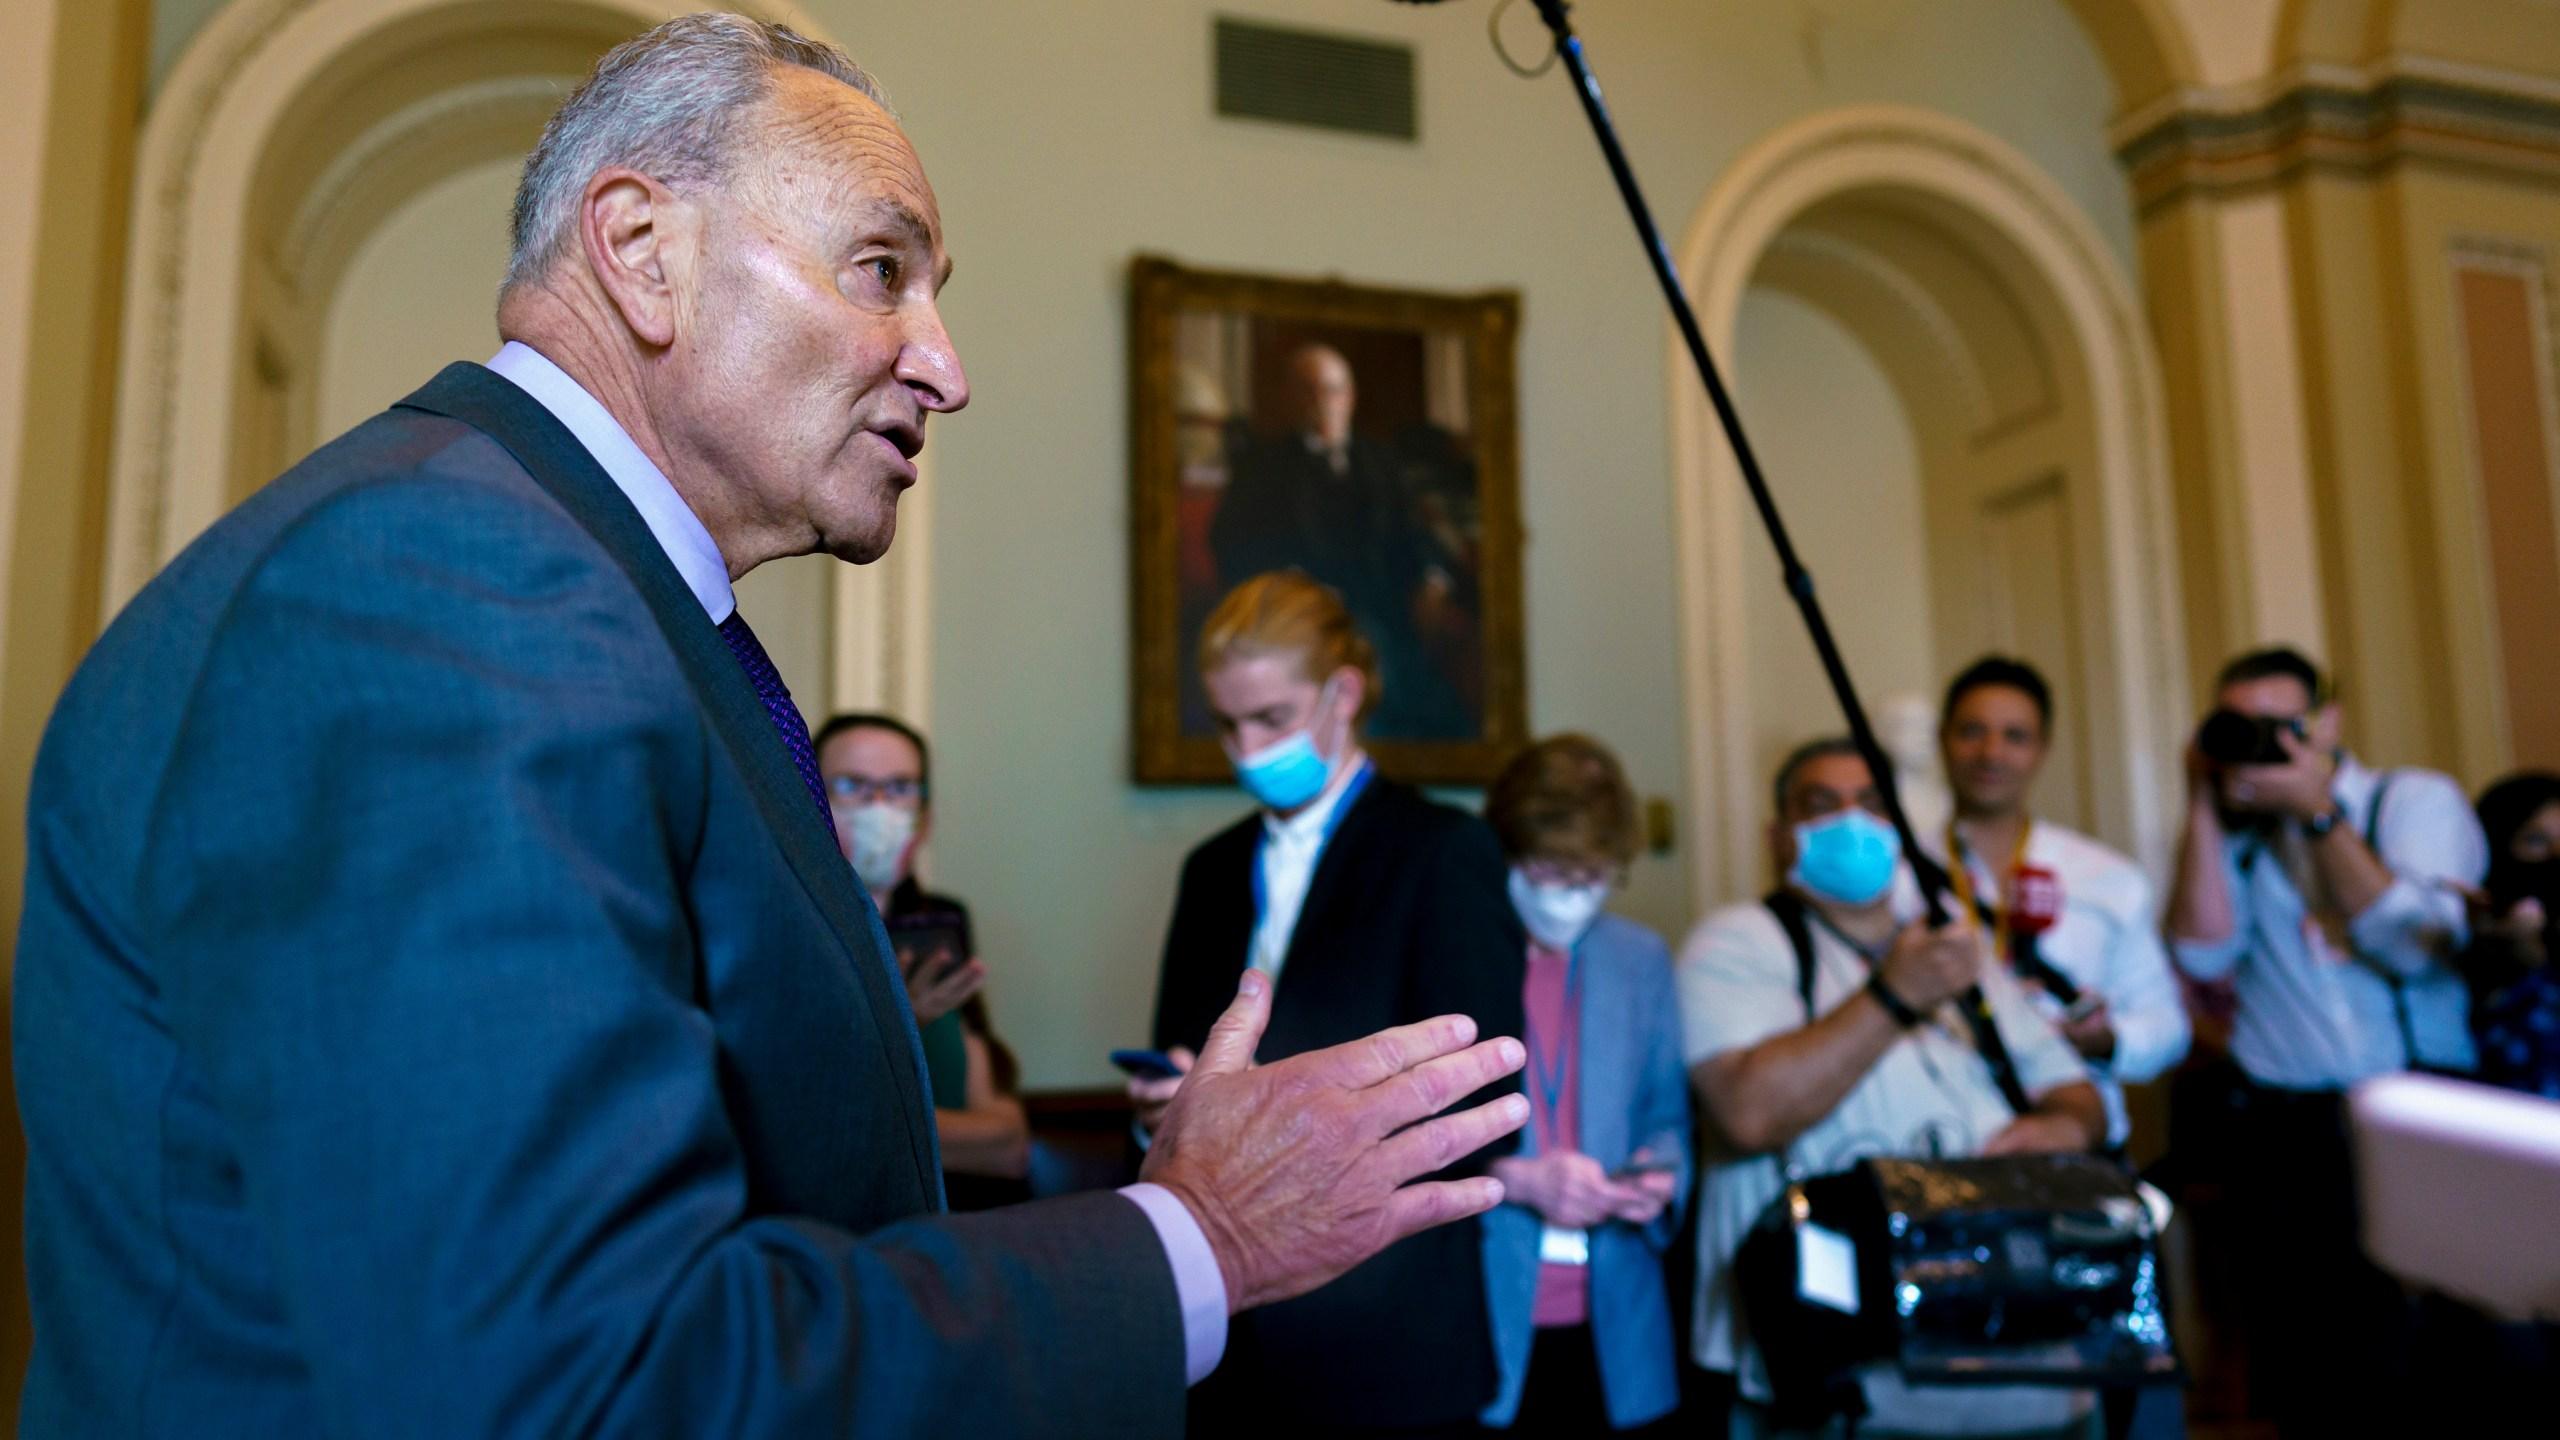 Senate Majority Leader Chuck Schumer, D-N.Y., updates reporters on the infrastructure negotiations between Republicans and Democrats,